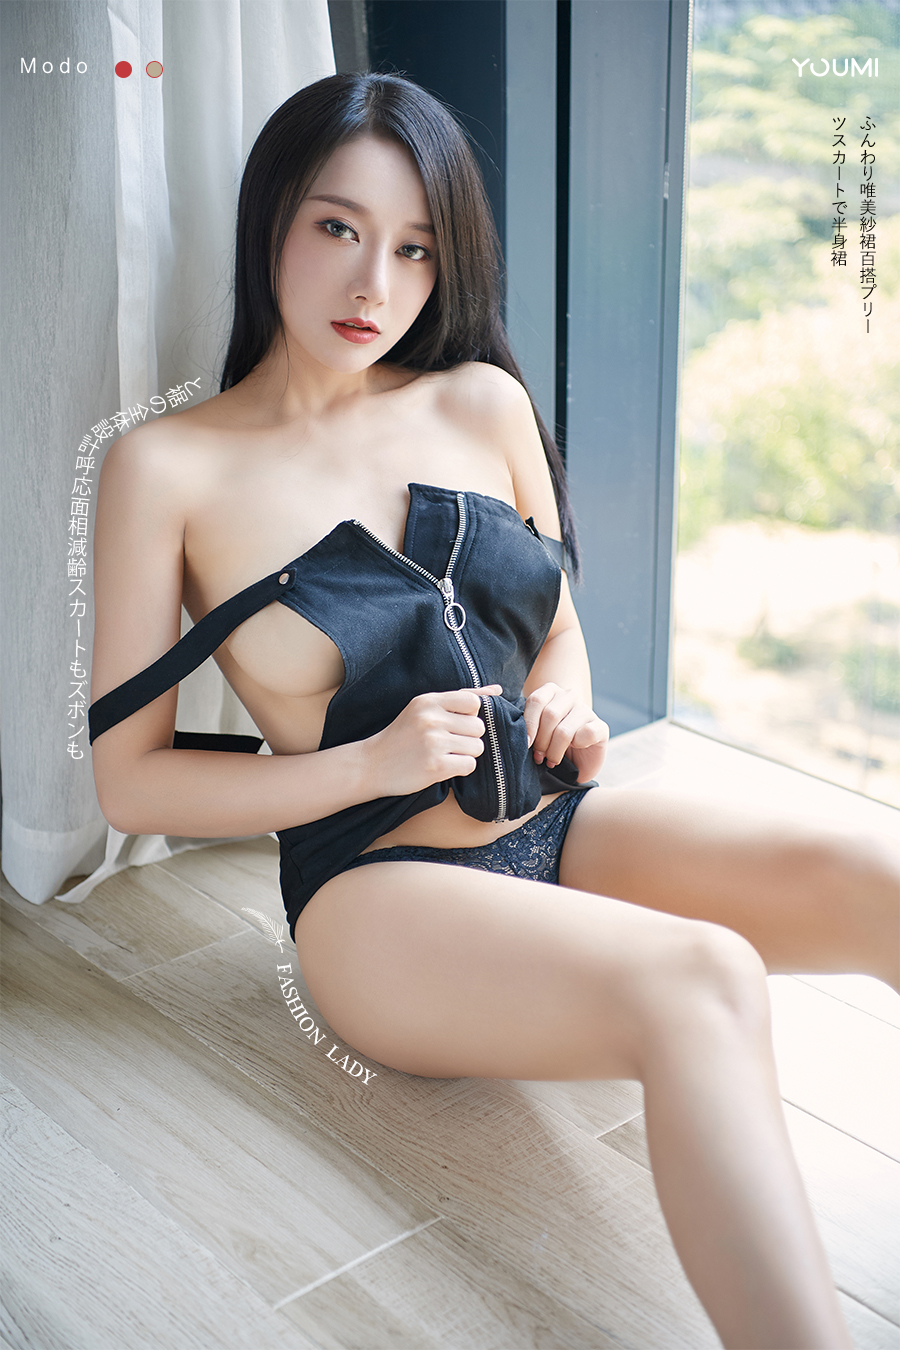 [YouMi尤蜜]2020.01.02 觅心情娘 何嘉颖[/20MB]